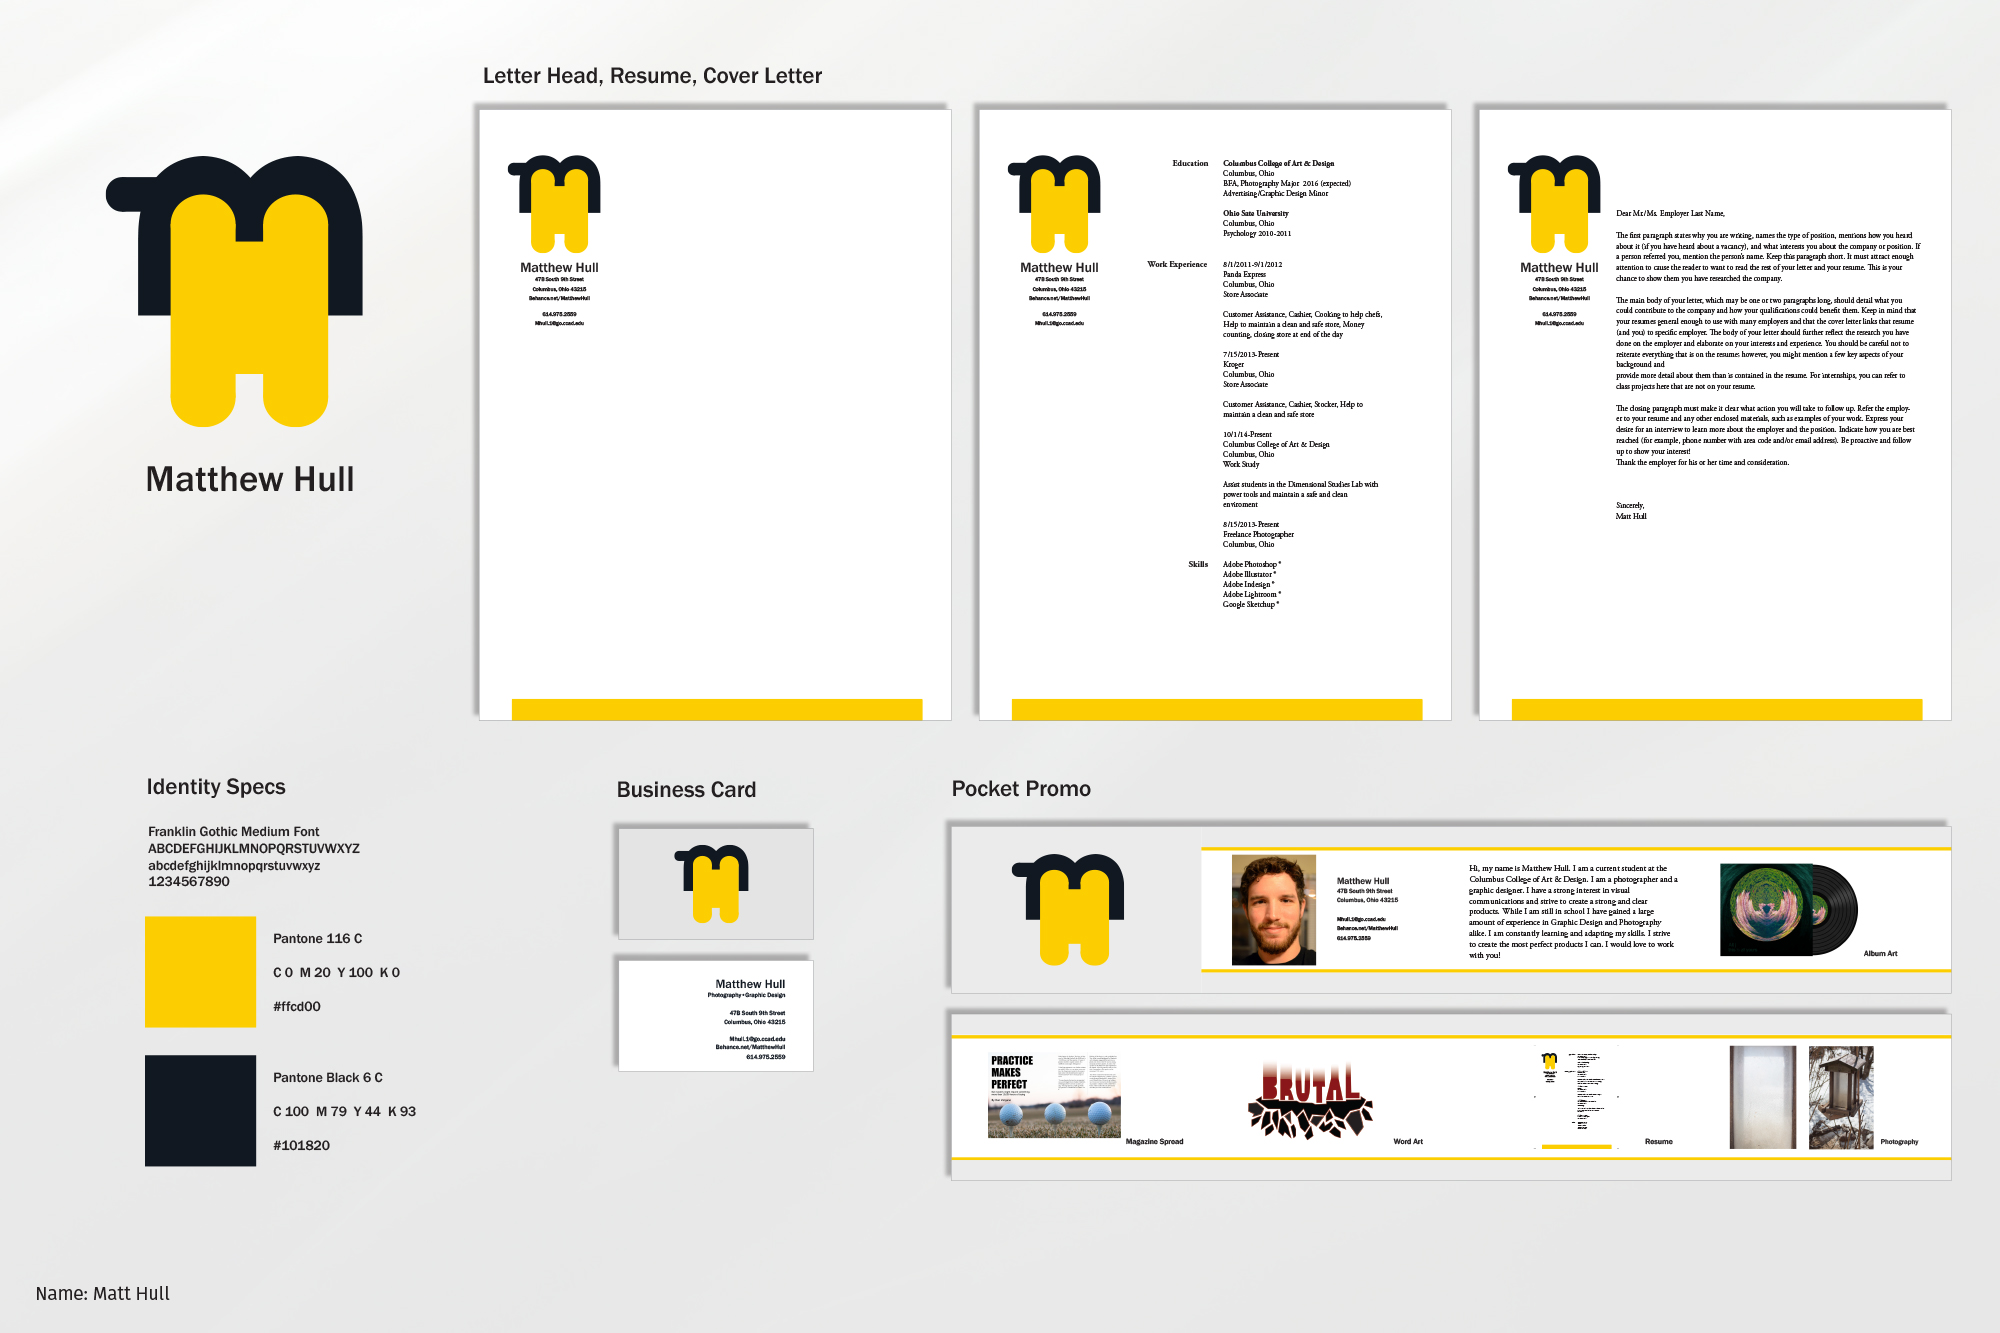 ADVE2291_Bennett_Identity Art_Matthew Hull.jpg